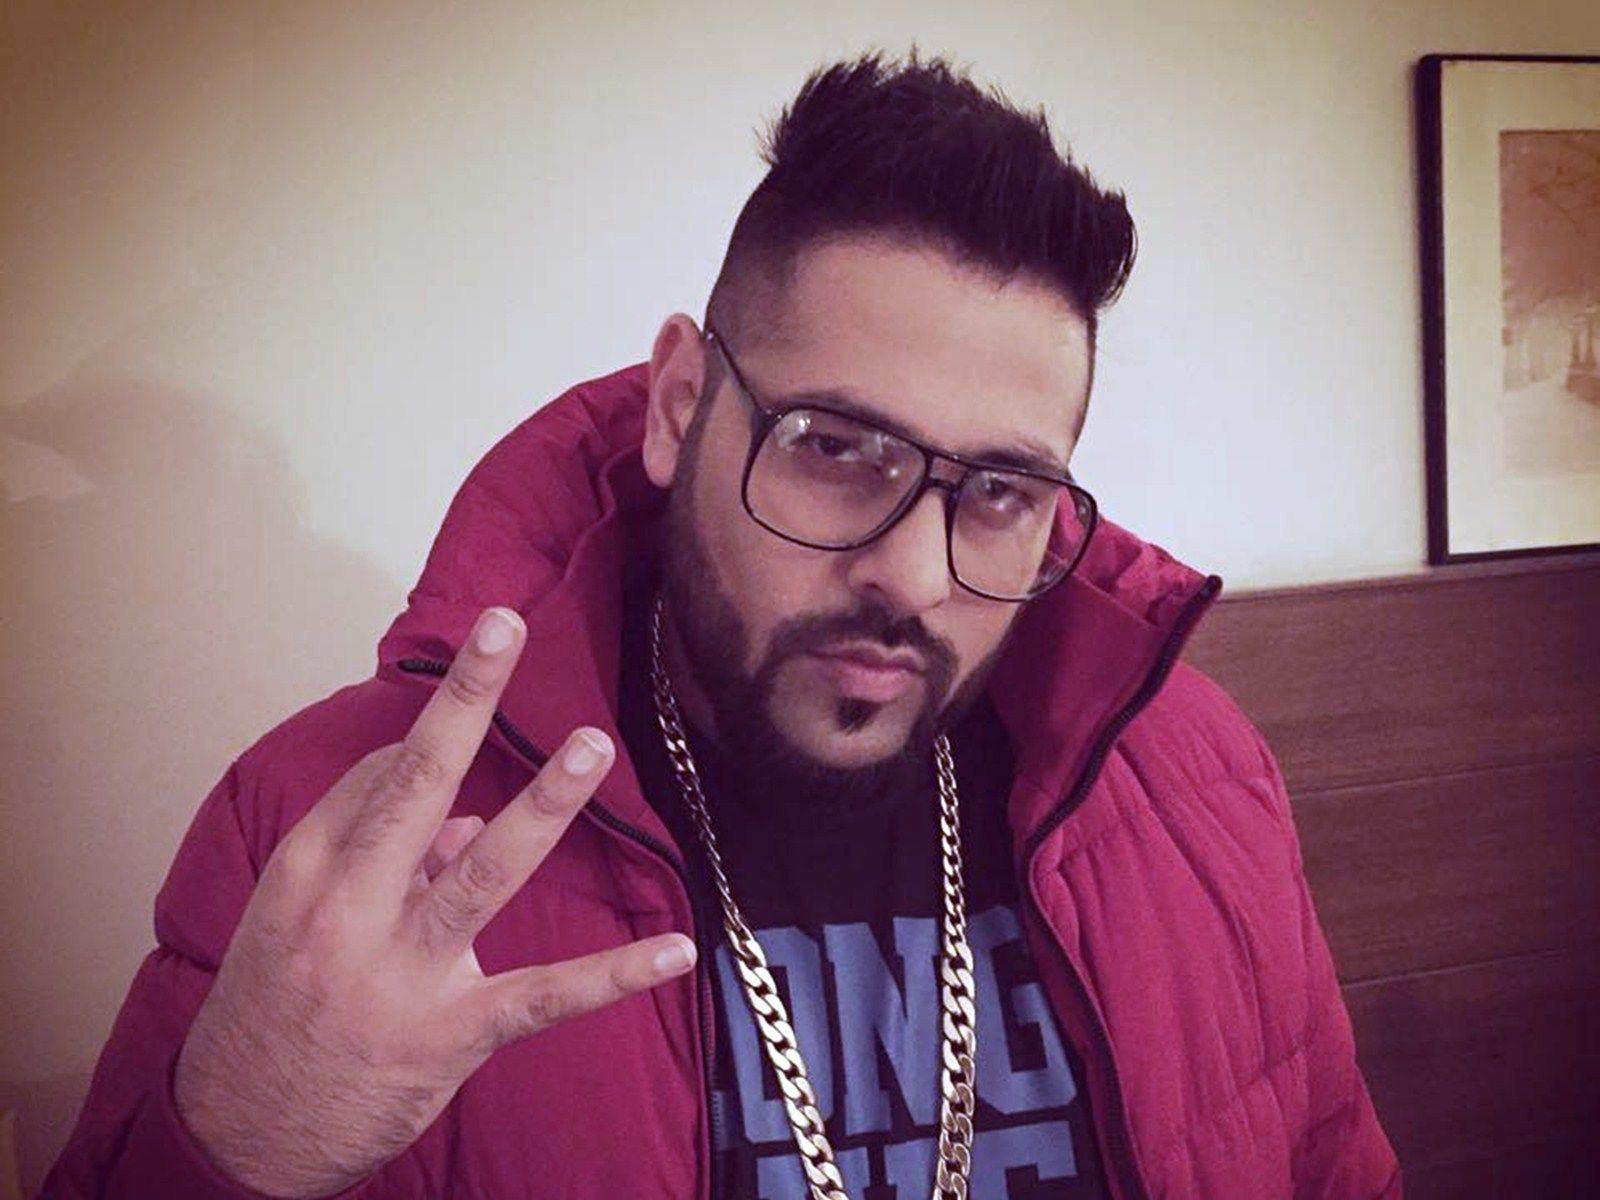 Badshah Wife, Badshah Wikipedia, Badshah Wife Photo, Badshah Weight, Badshah Wiki,, Badshah Wiki Age, Badshah Wiki Picture, Badshah Age, Badshah Rapper Wife, Badshah Rapper Wiki, Badshah Rapper Net Worth, Badshah Rapper Caste, Badshah Rapper Real Name, Badshah Rapper Residence, Badshah Rapper Religion, Badshah Rapper Biography, Real Name Of Badshah Punjabi Rapper, Rapper Badshah Biography, Badshah Singer Wiki, Badshah Singer Instagram, Badshah Singer Biodata, Badshah Singer Birthplace, Badshah Singer Born, Badshah Singer Birthday